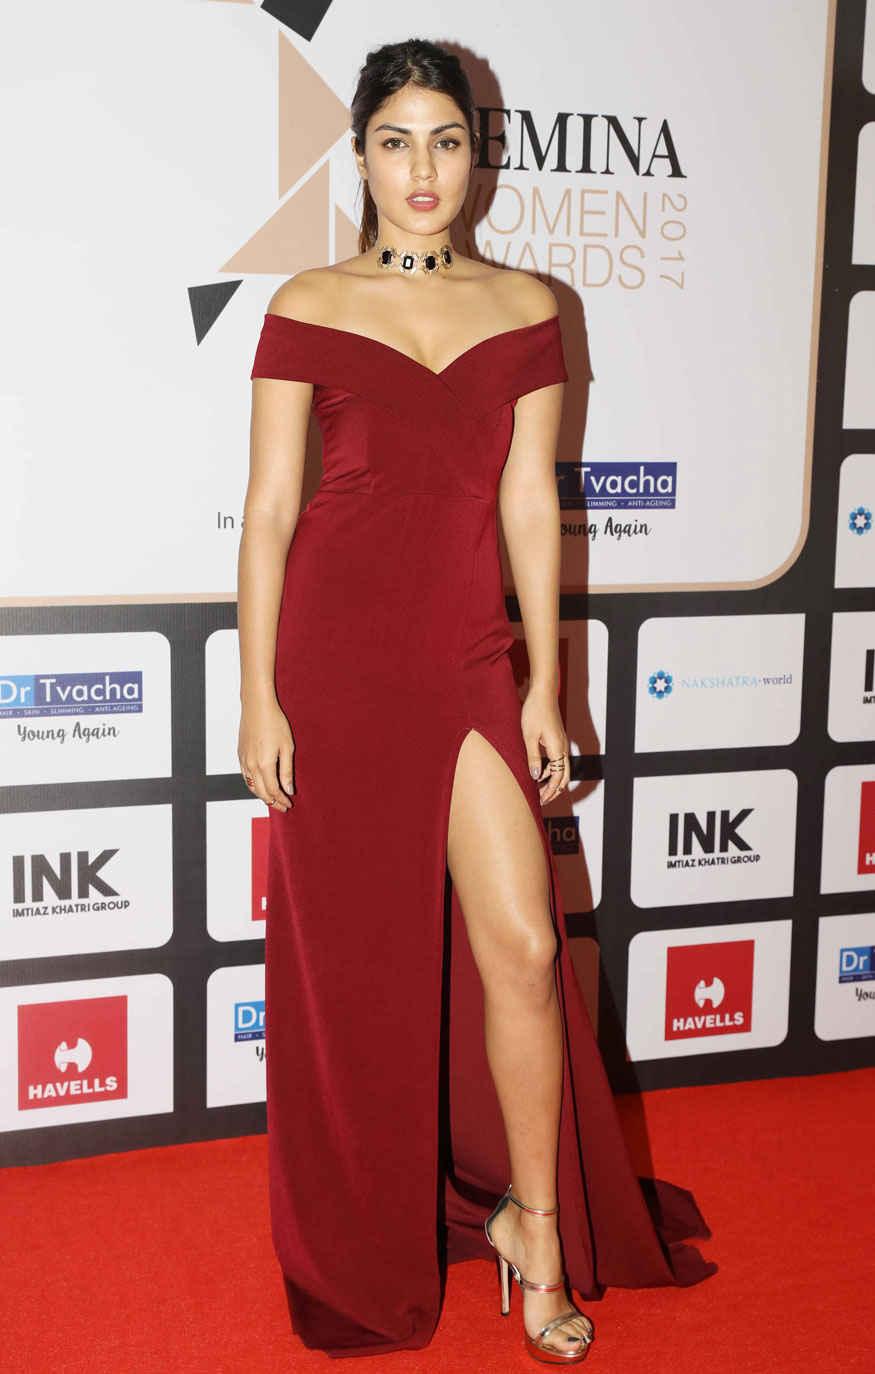 Rhea Chakraborty Poses During Femina Women Awards 2017 Event